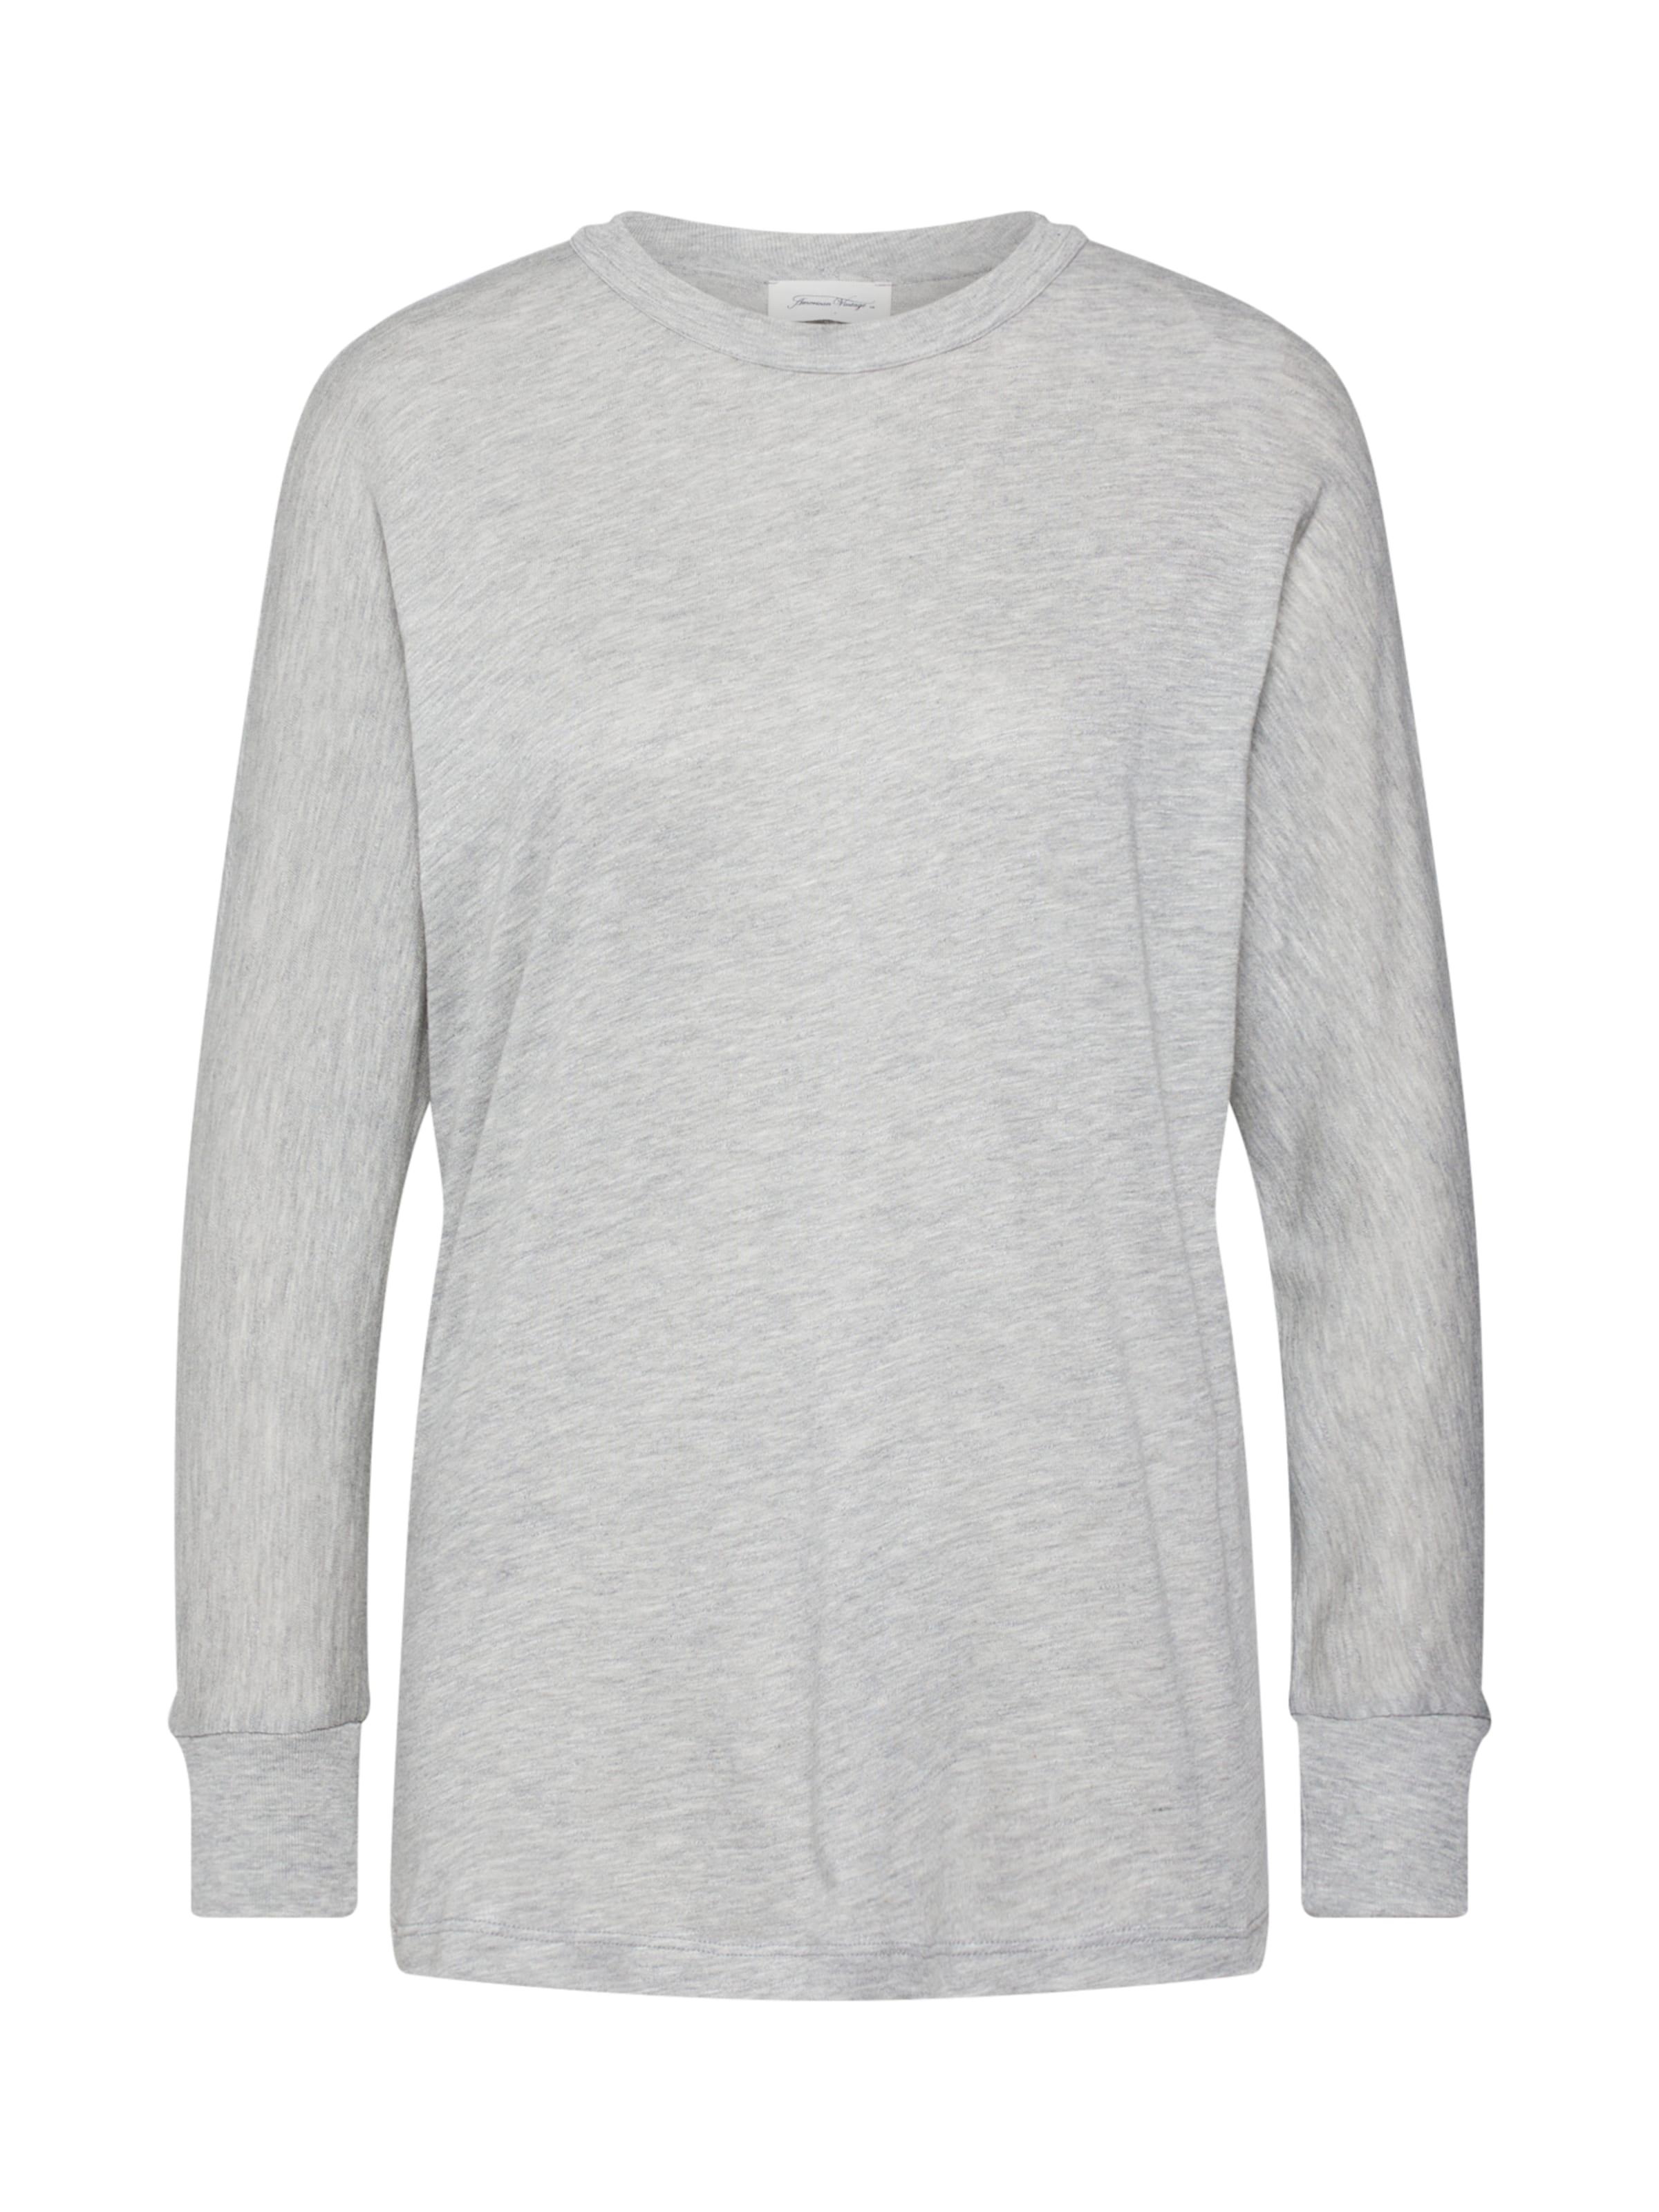 shirt T American En Clair Vintage Gris 'kobi59h19' 4SAjcq3L5R